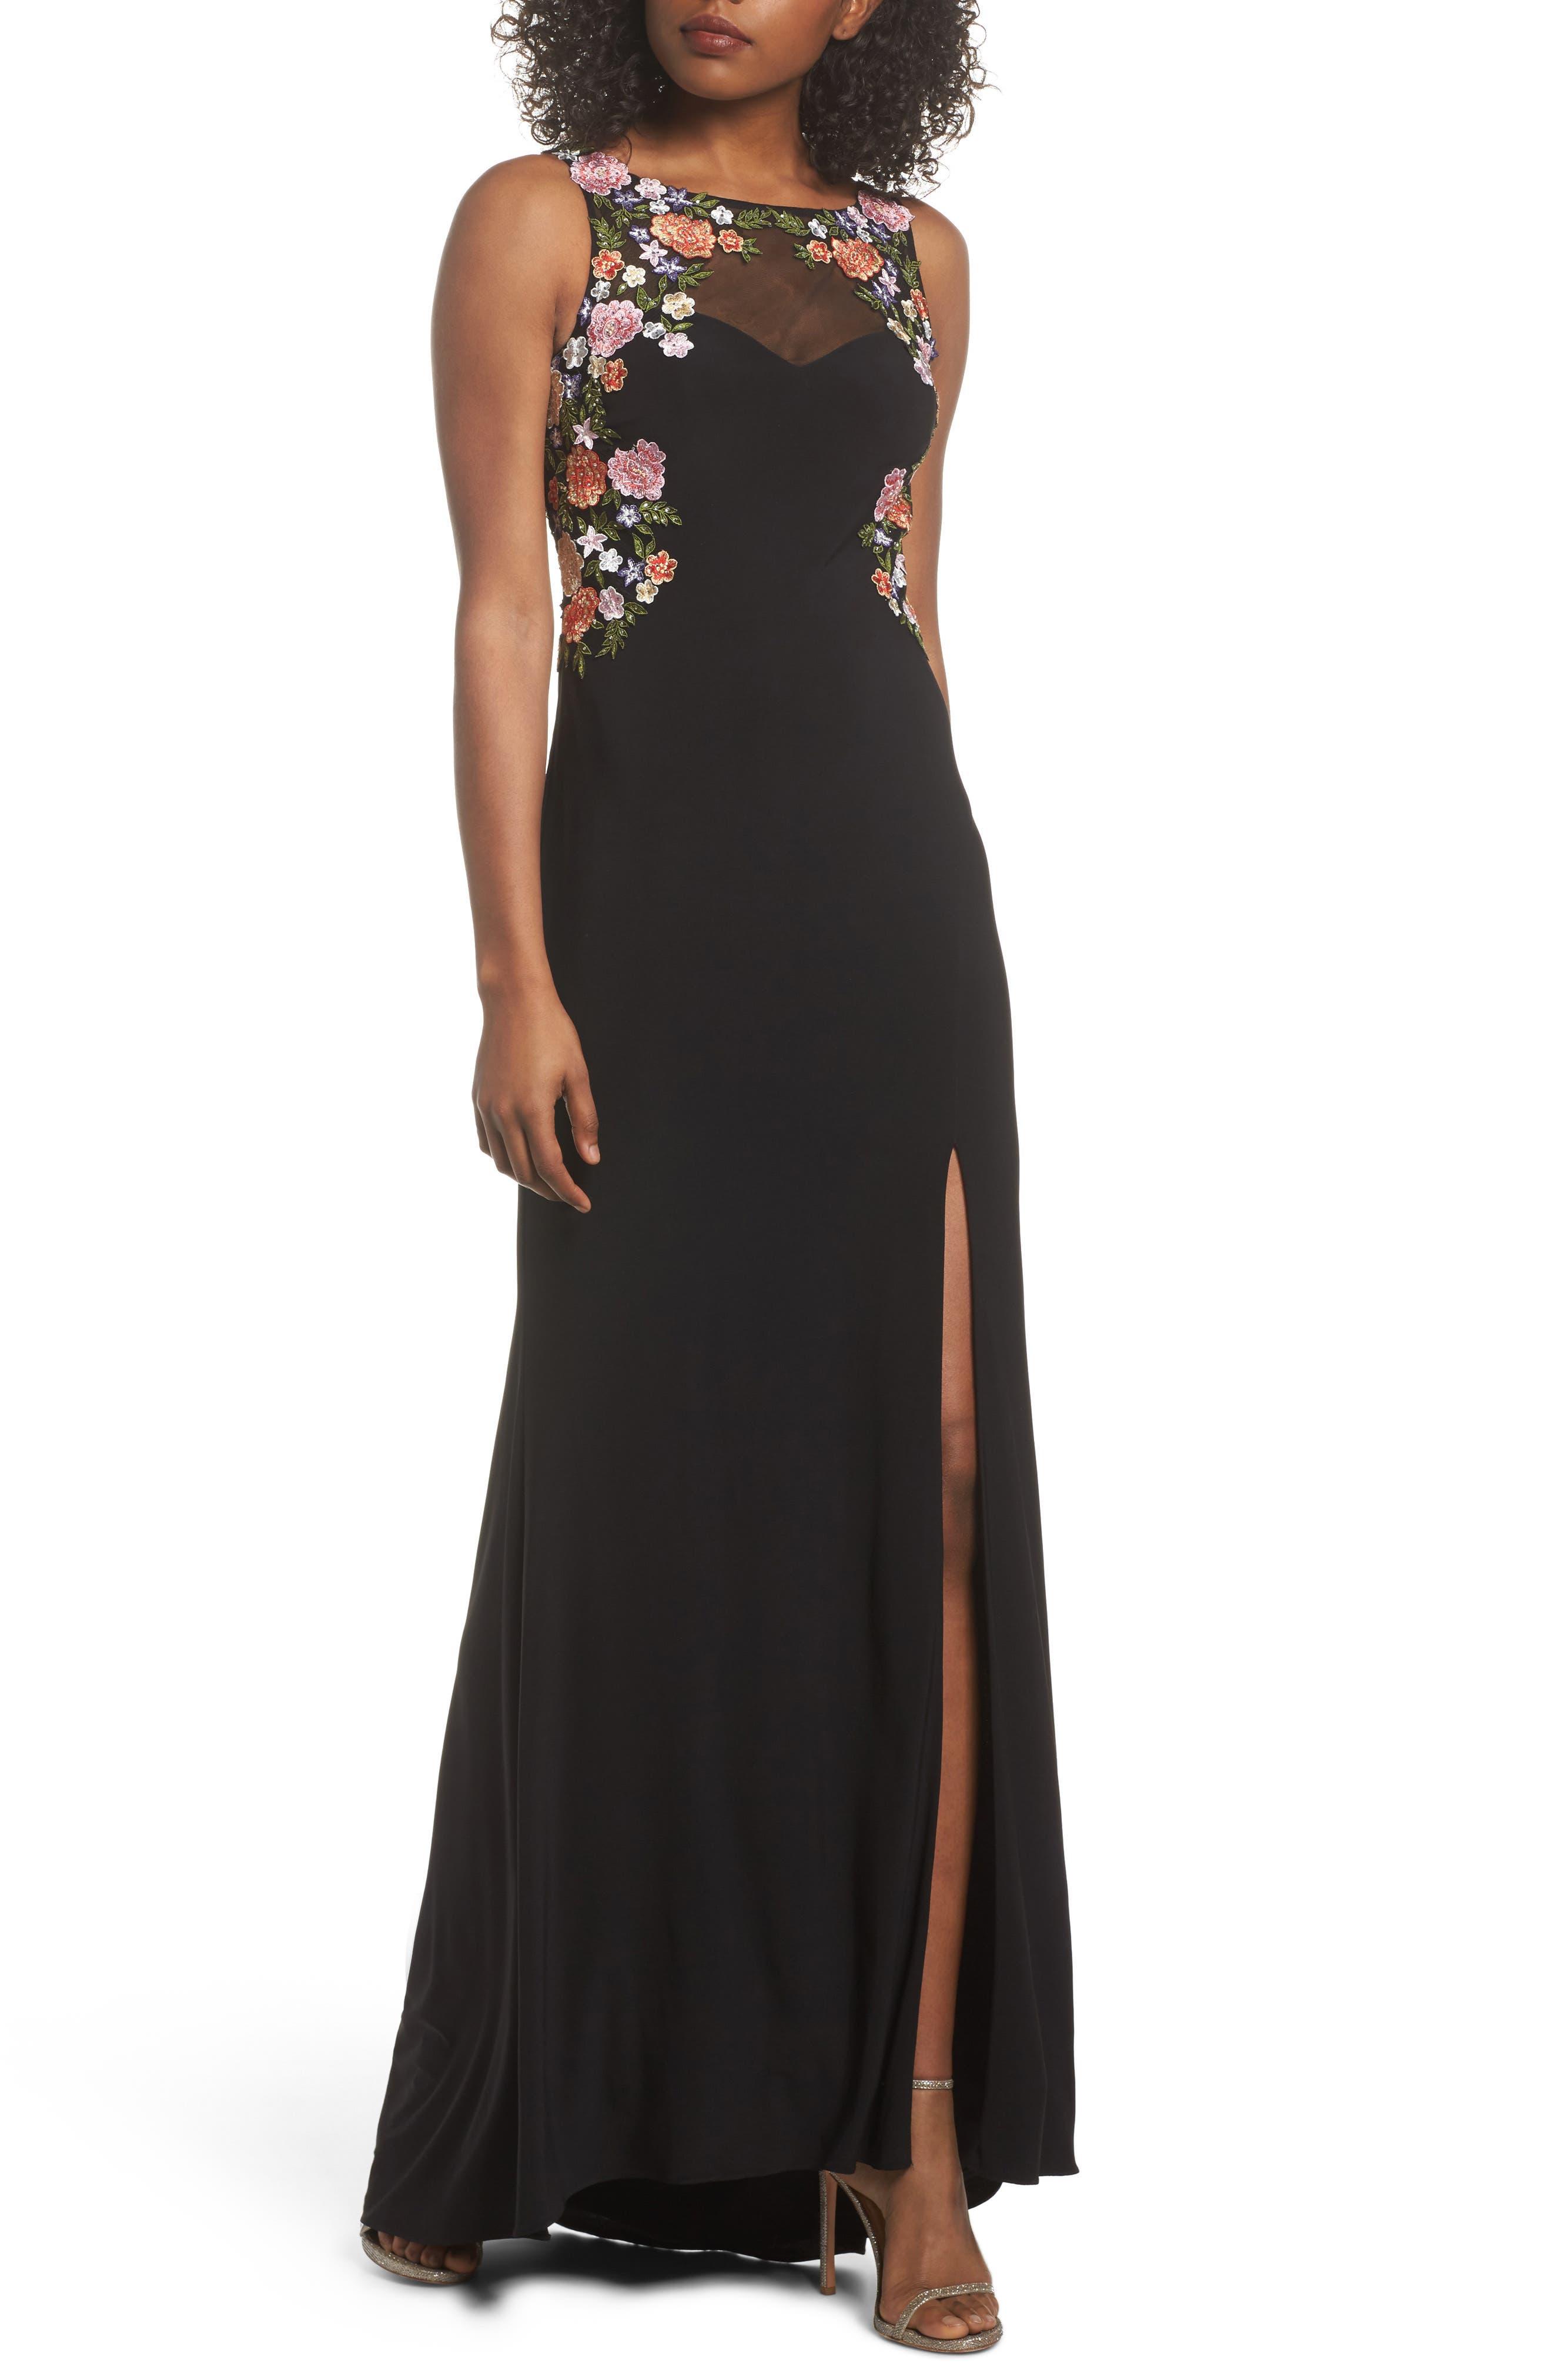 Blondie Nites Embellished Sheer Back Knit Gown, Black